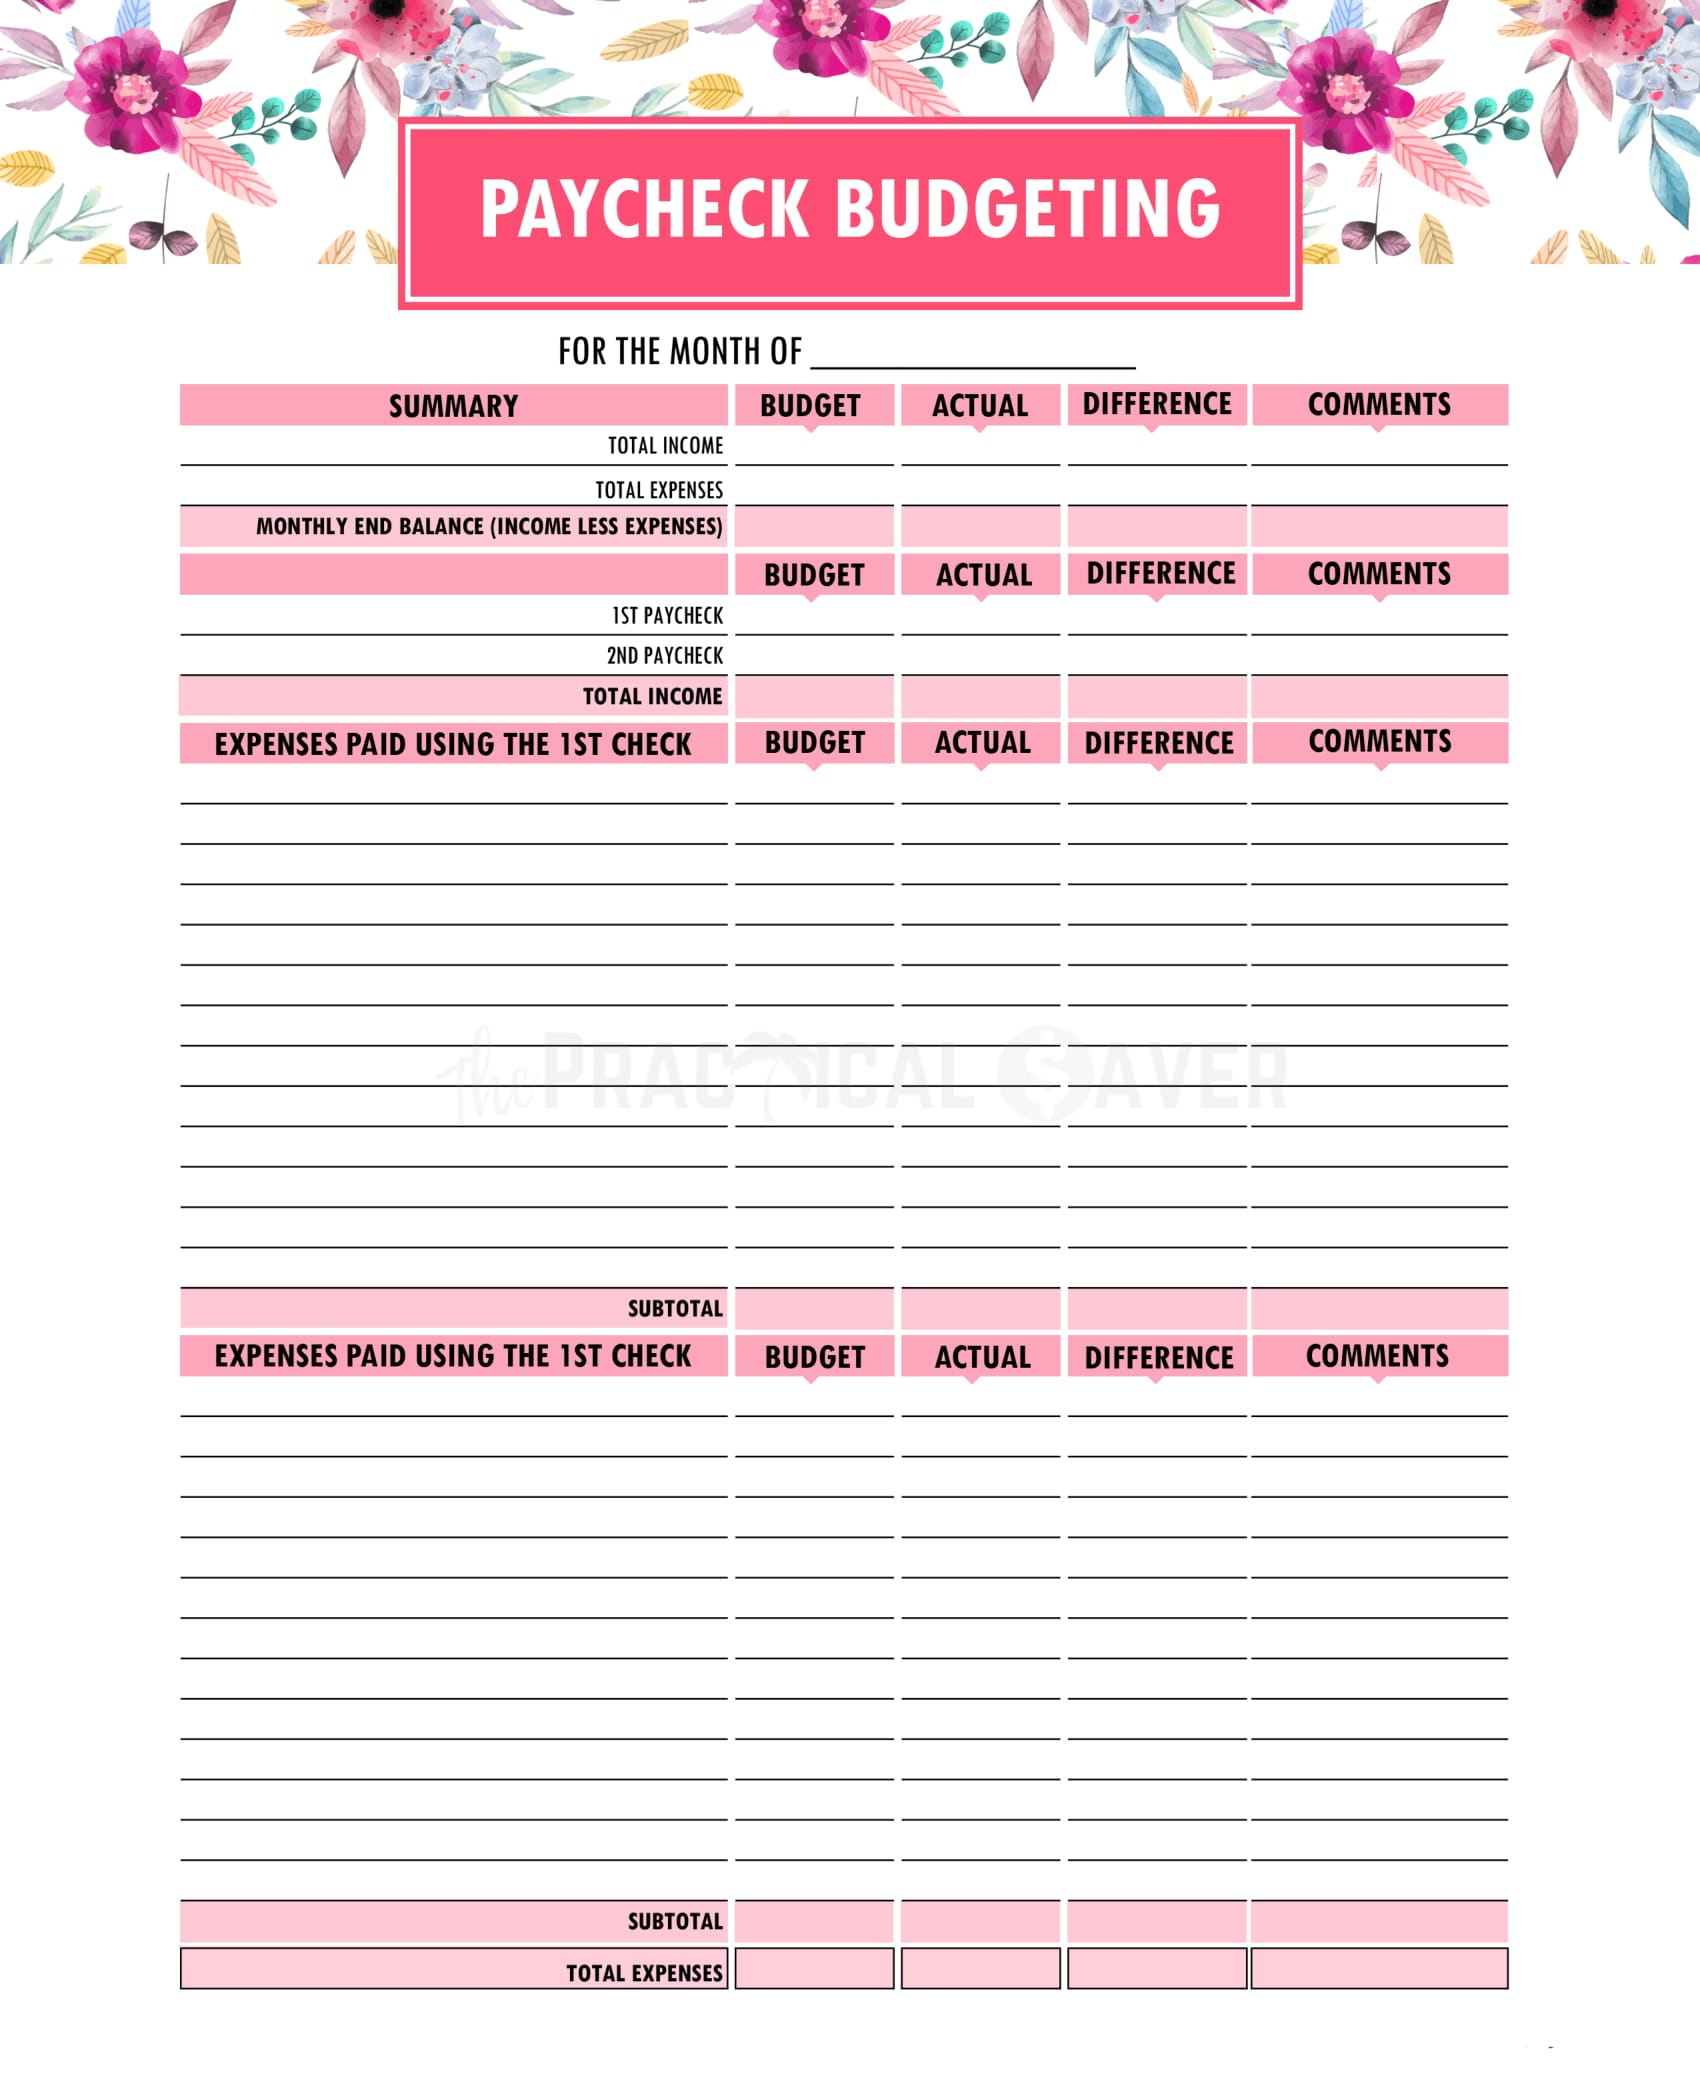 Budget Binder Printables - The Practical Saver - Free Printable Budget Binder Worksheets